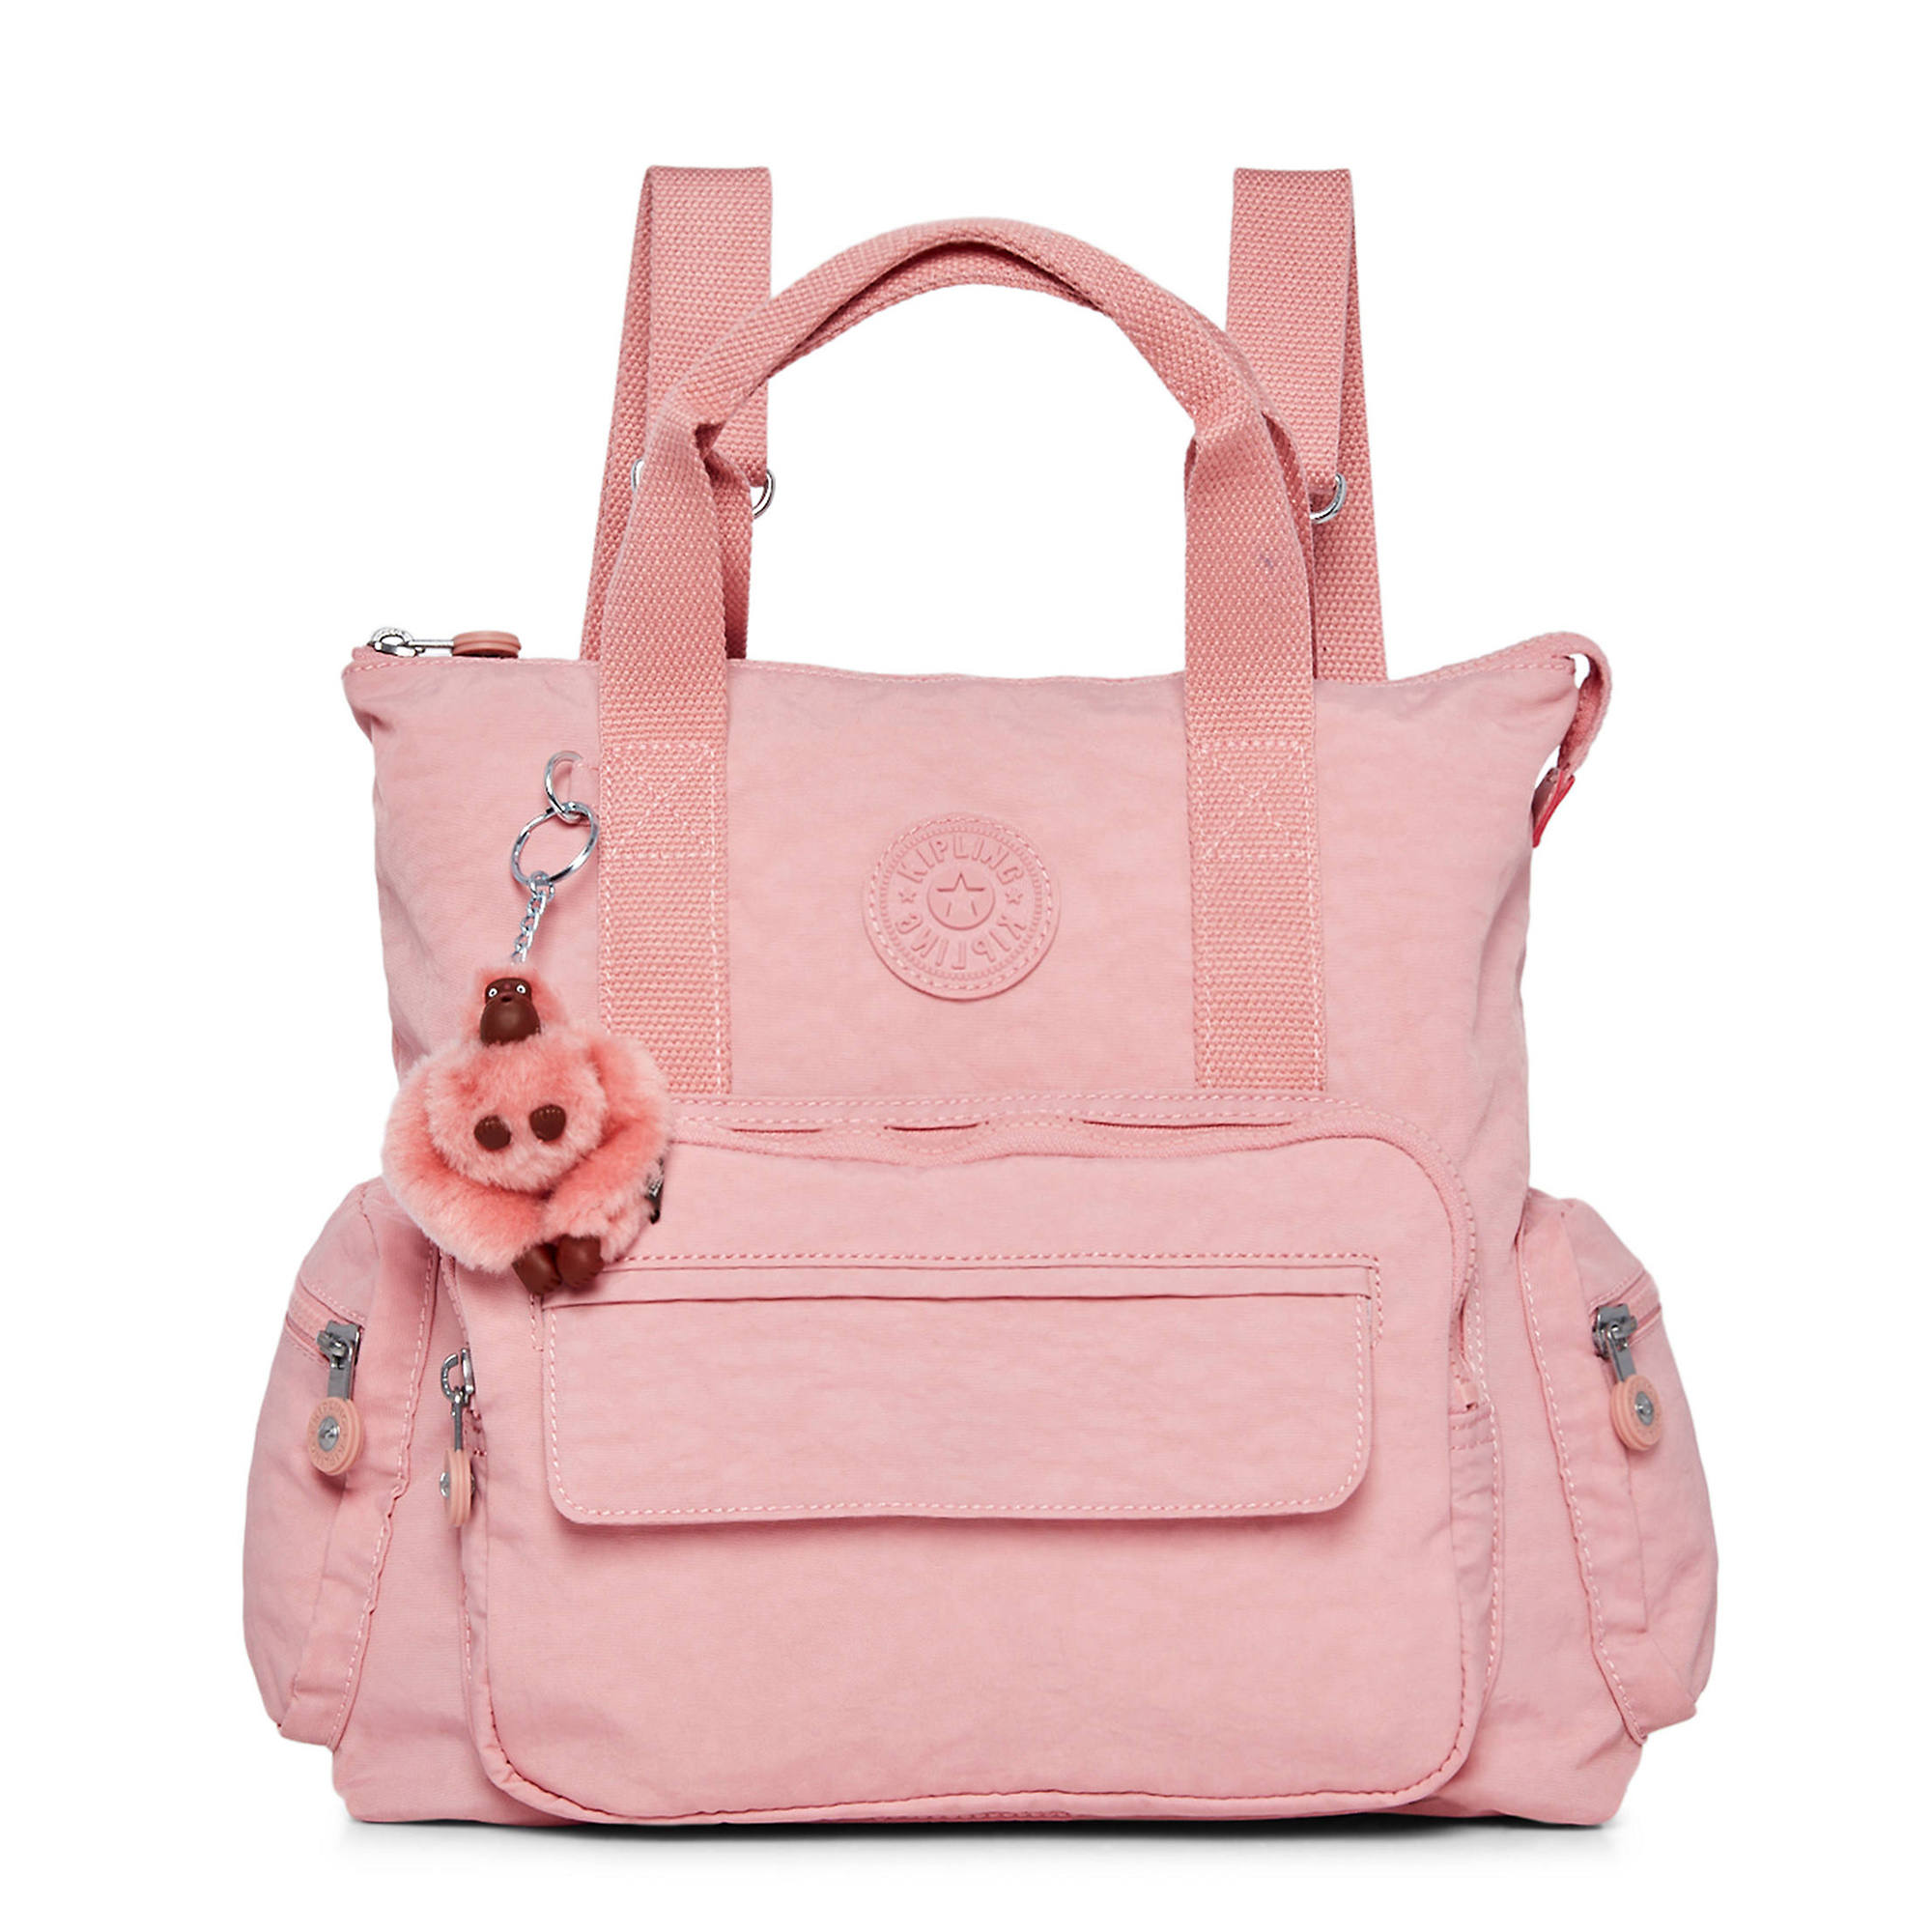 Kipling-Alvy-2-In-1-Convertible-Tote-Bag-Backpack miniatura 37